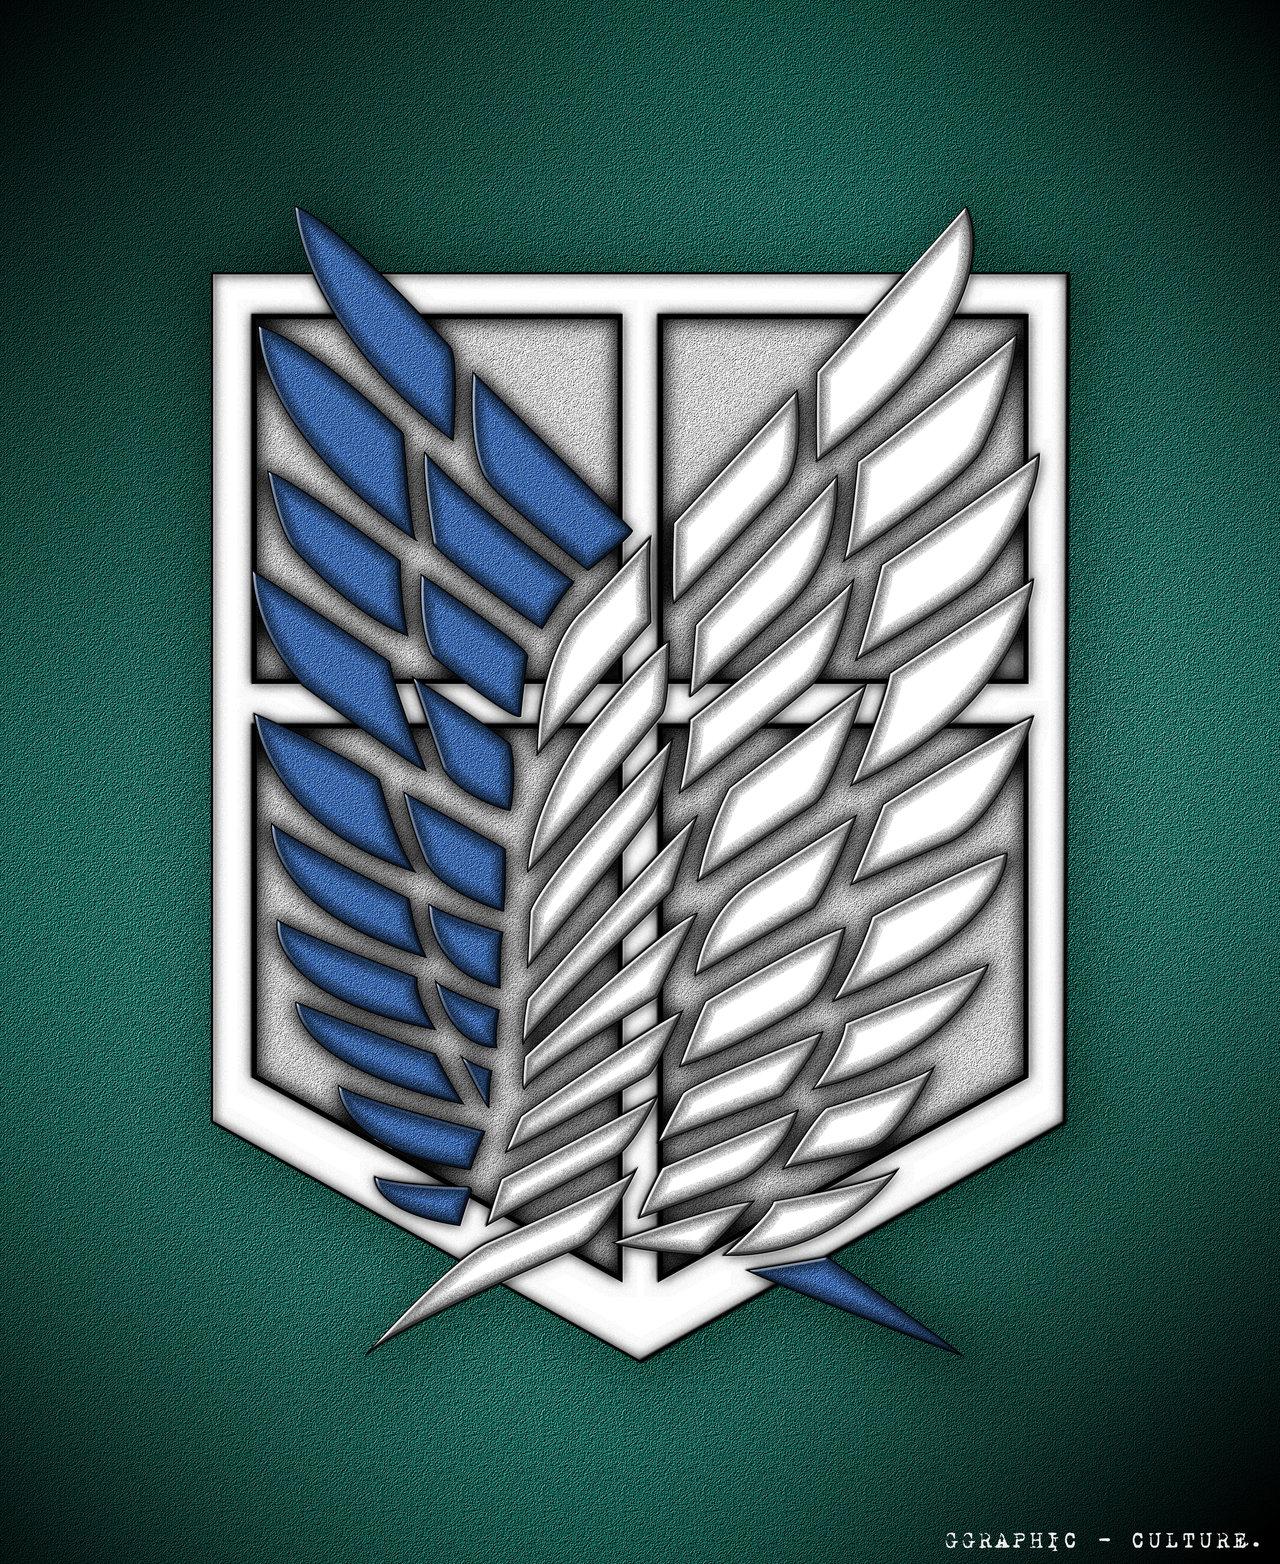 Free Download On Titan Wallpaper Hd Scouting Legion Shingeki